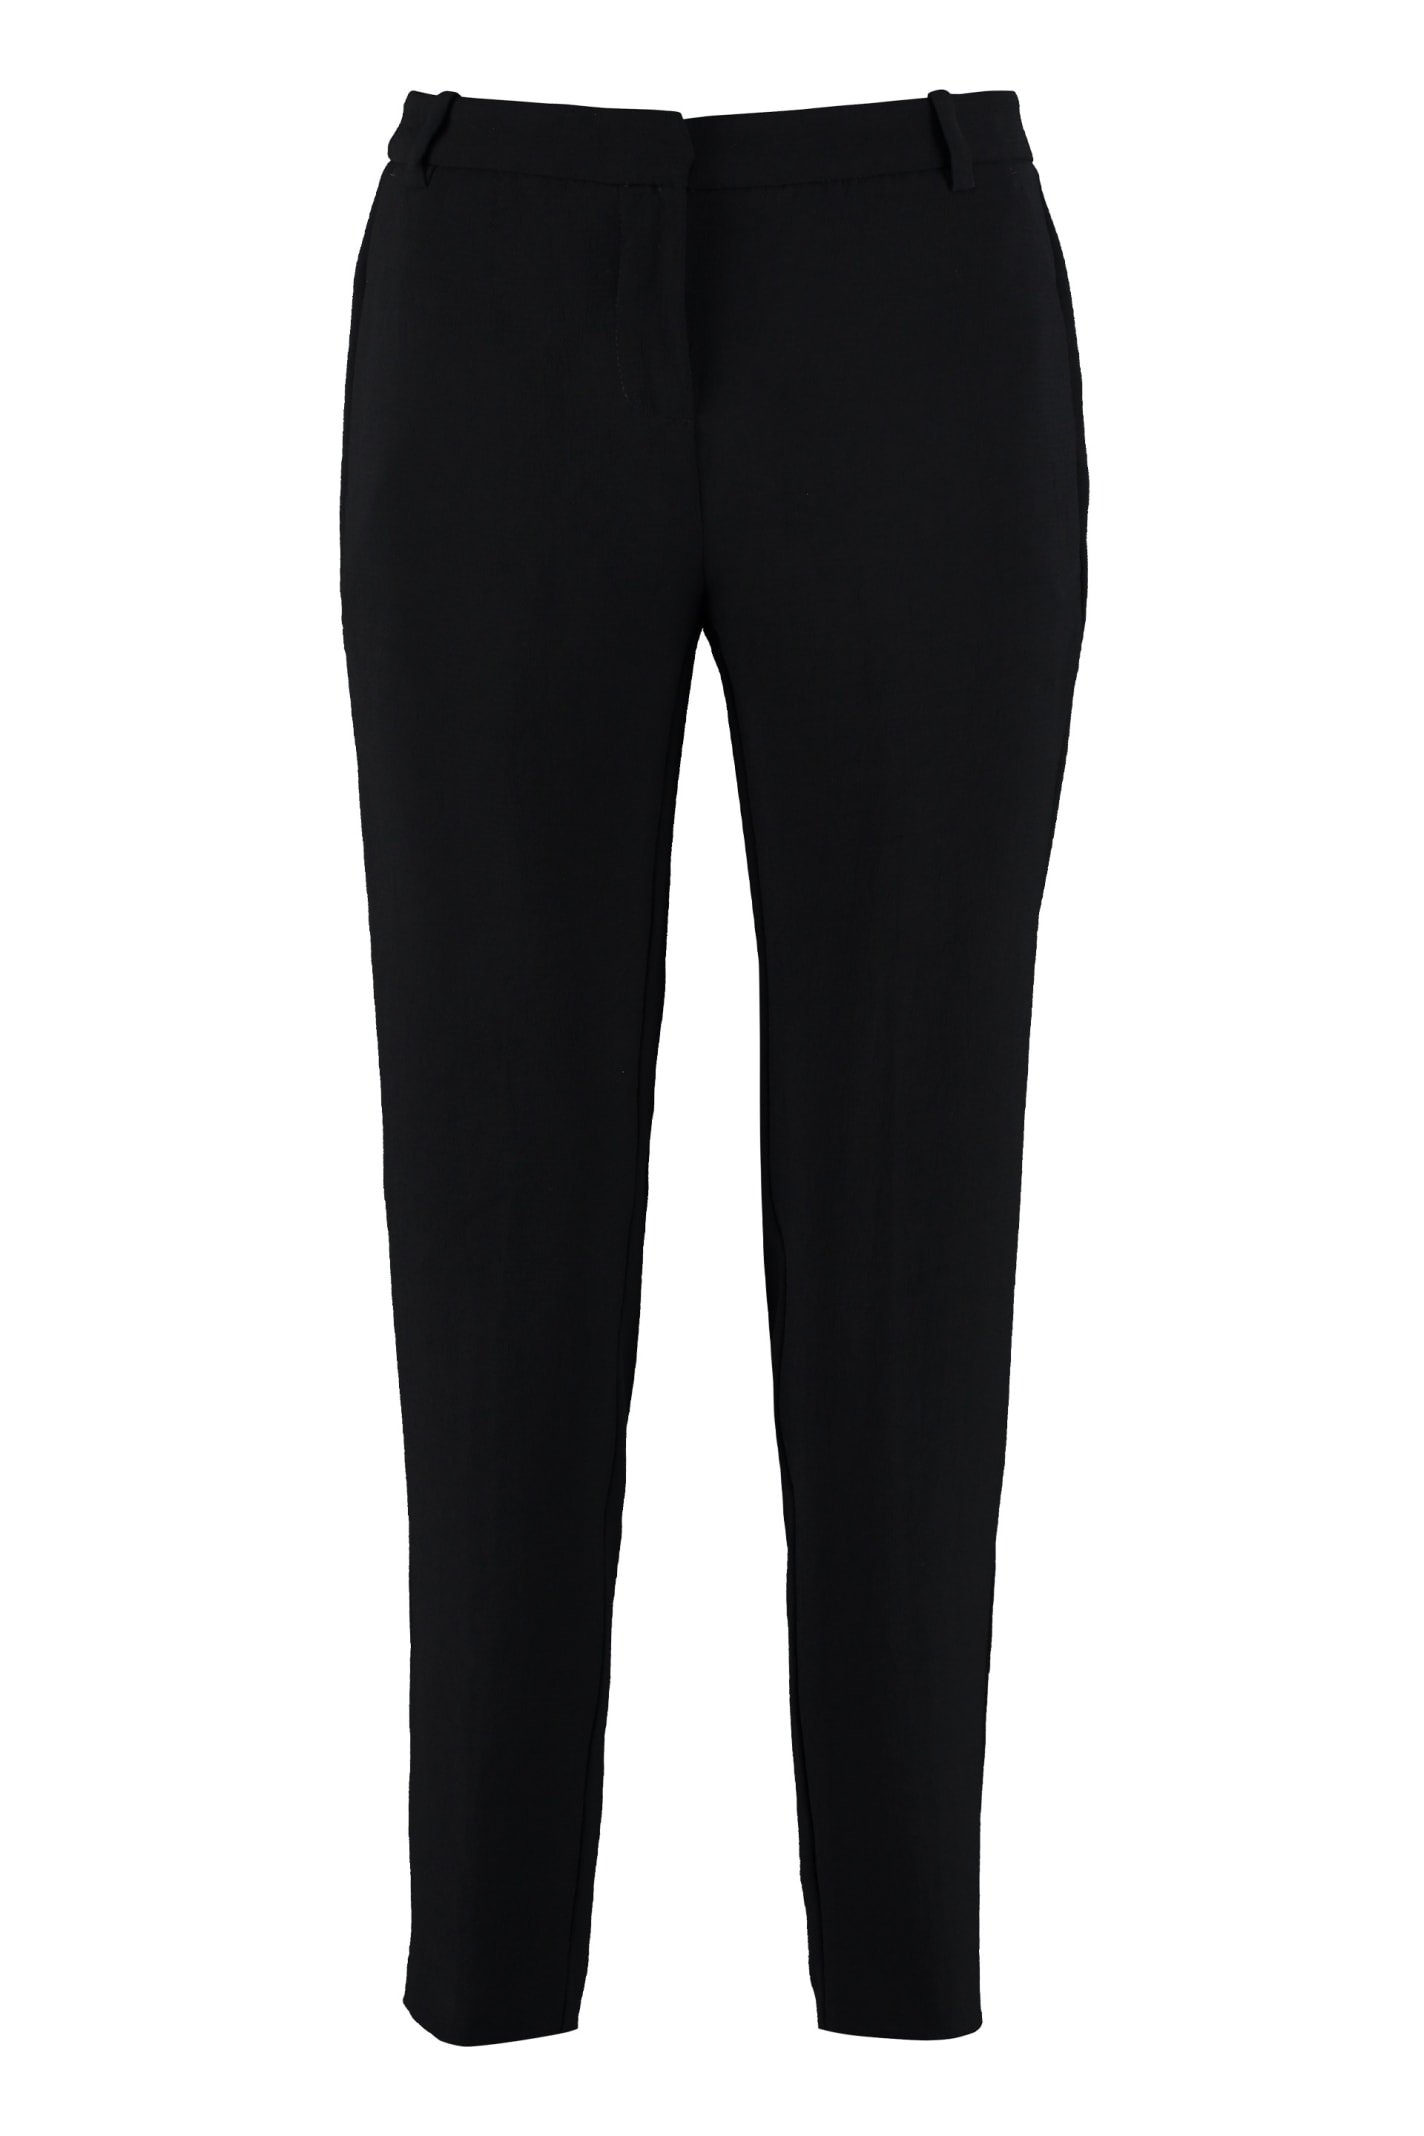 Pinko Bello Cropped Crêpe Trousers